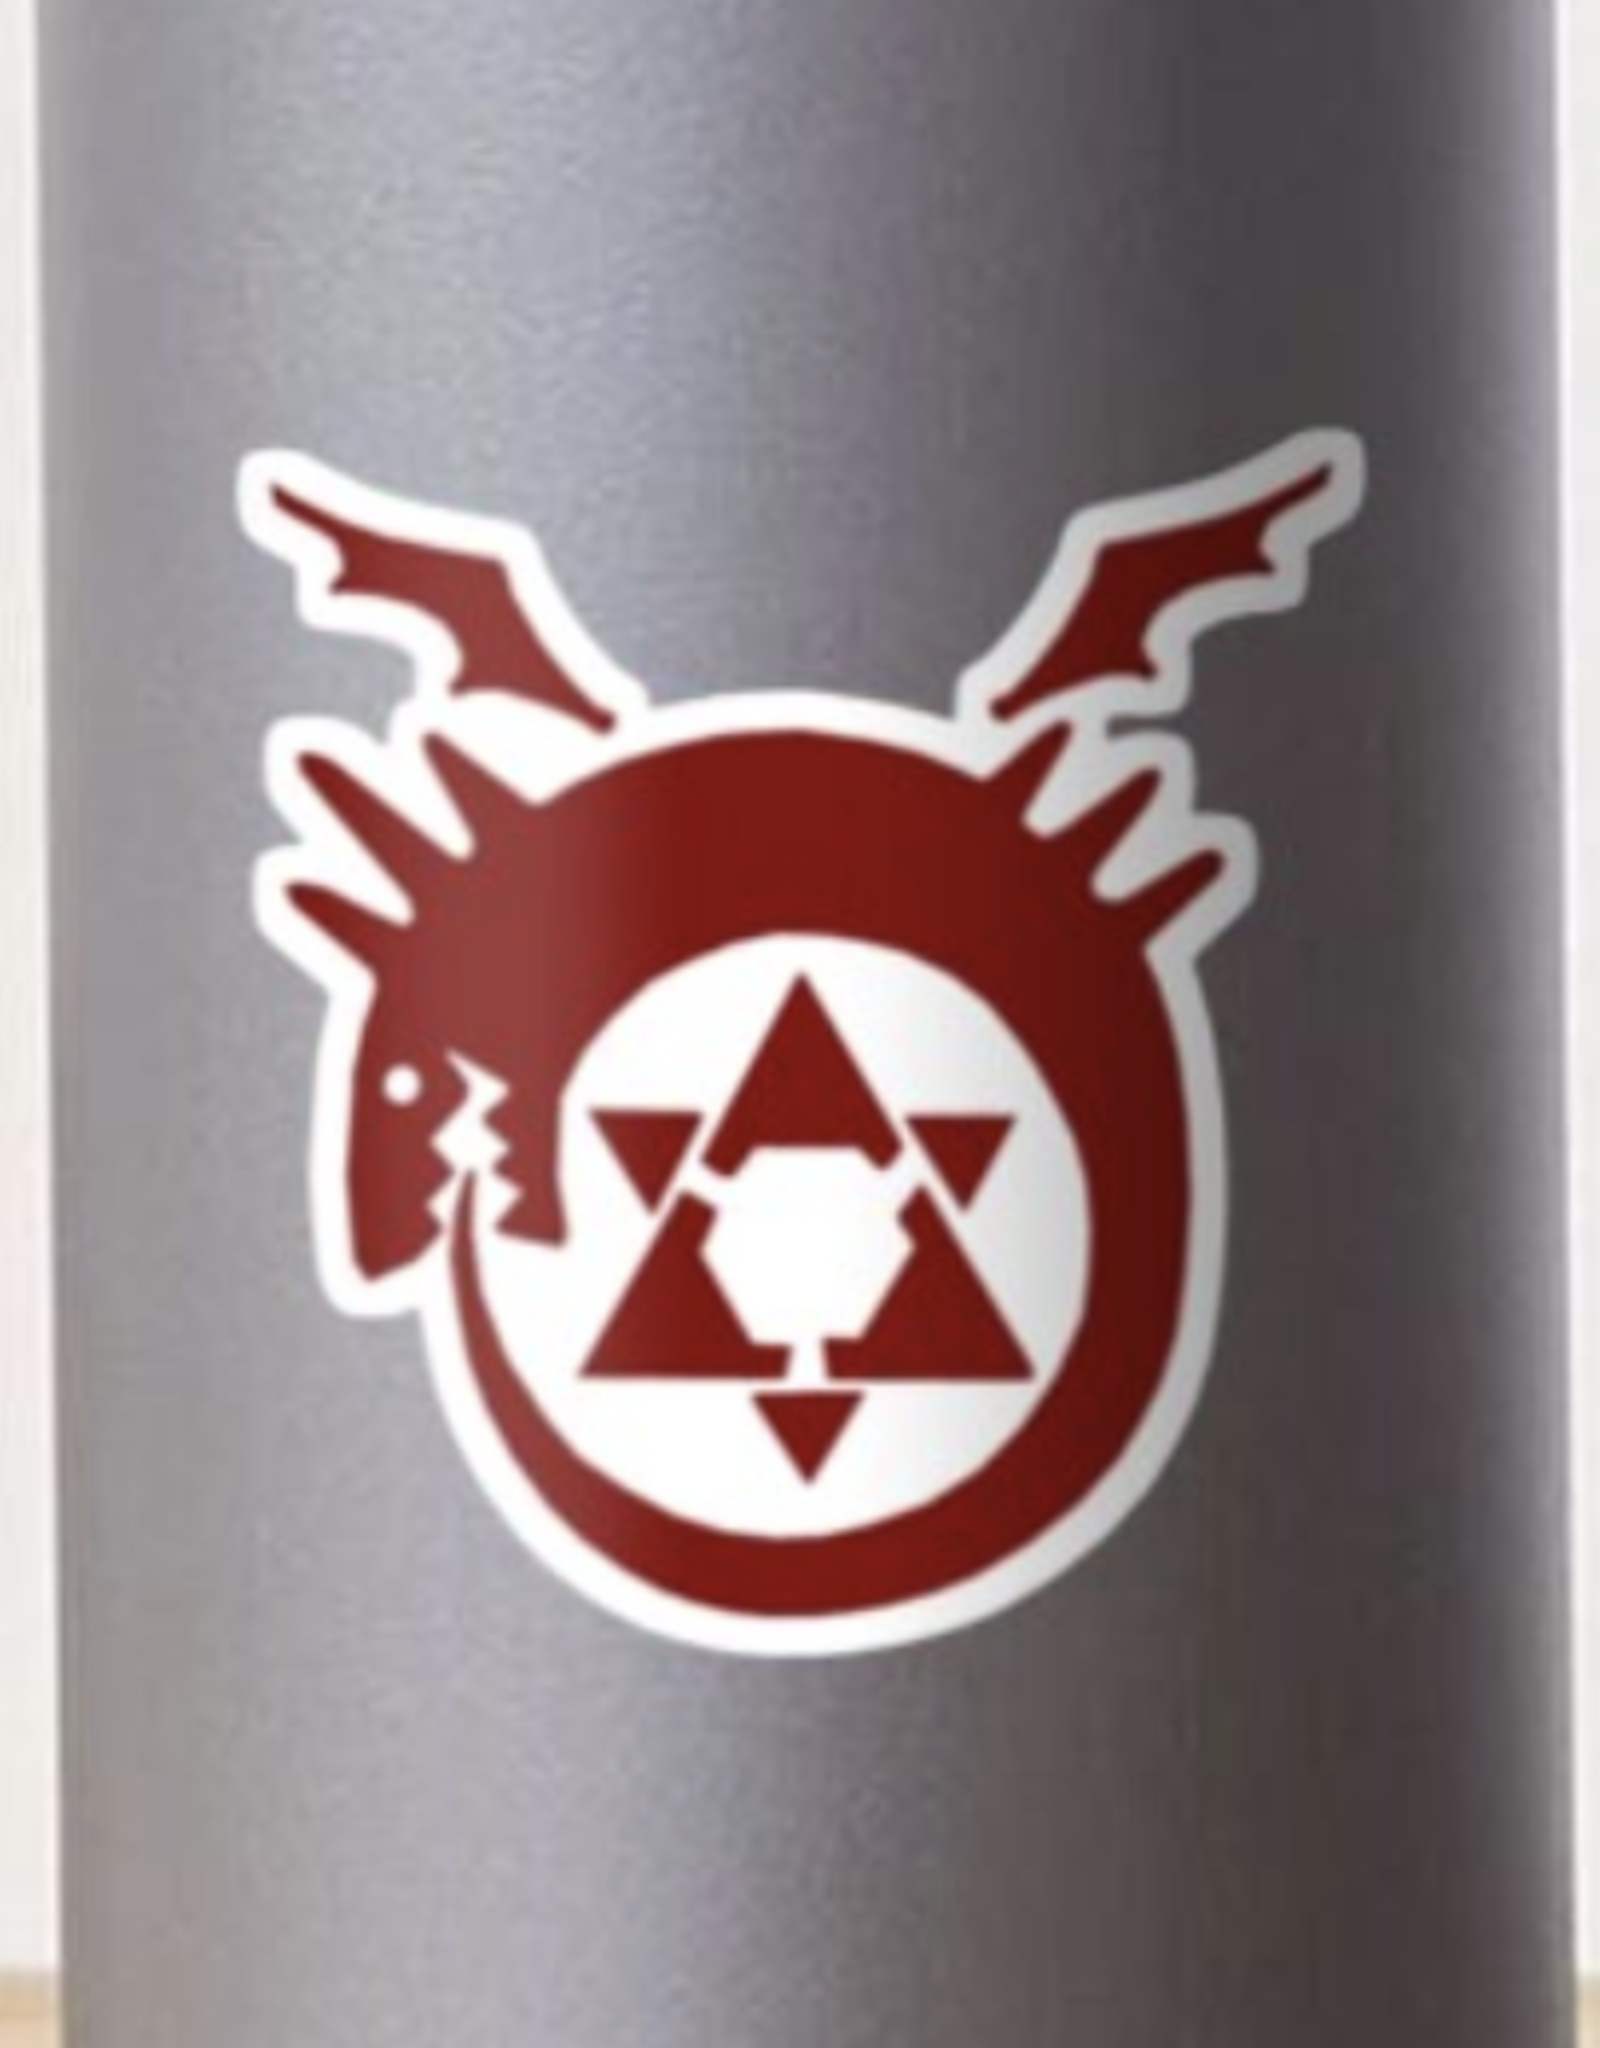 FMA Symbols #3 Sticker